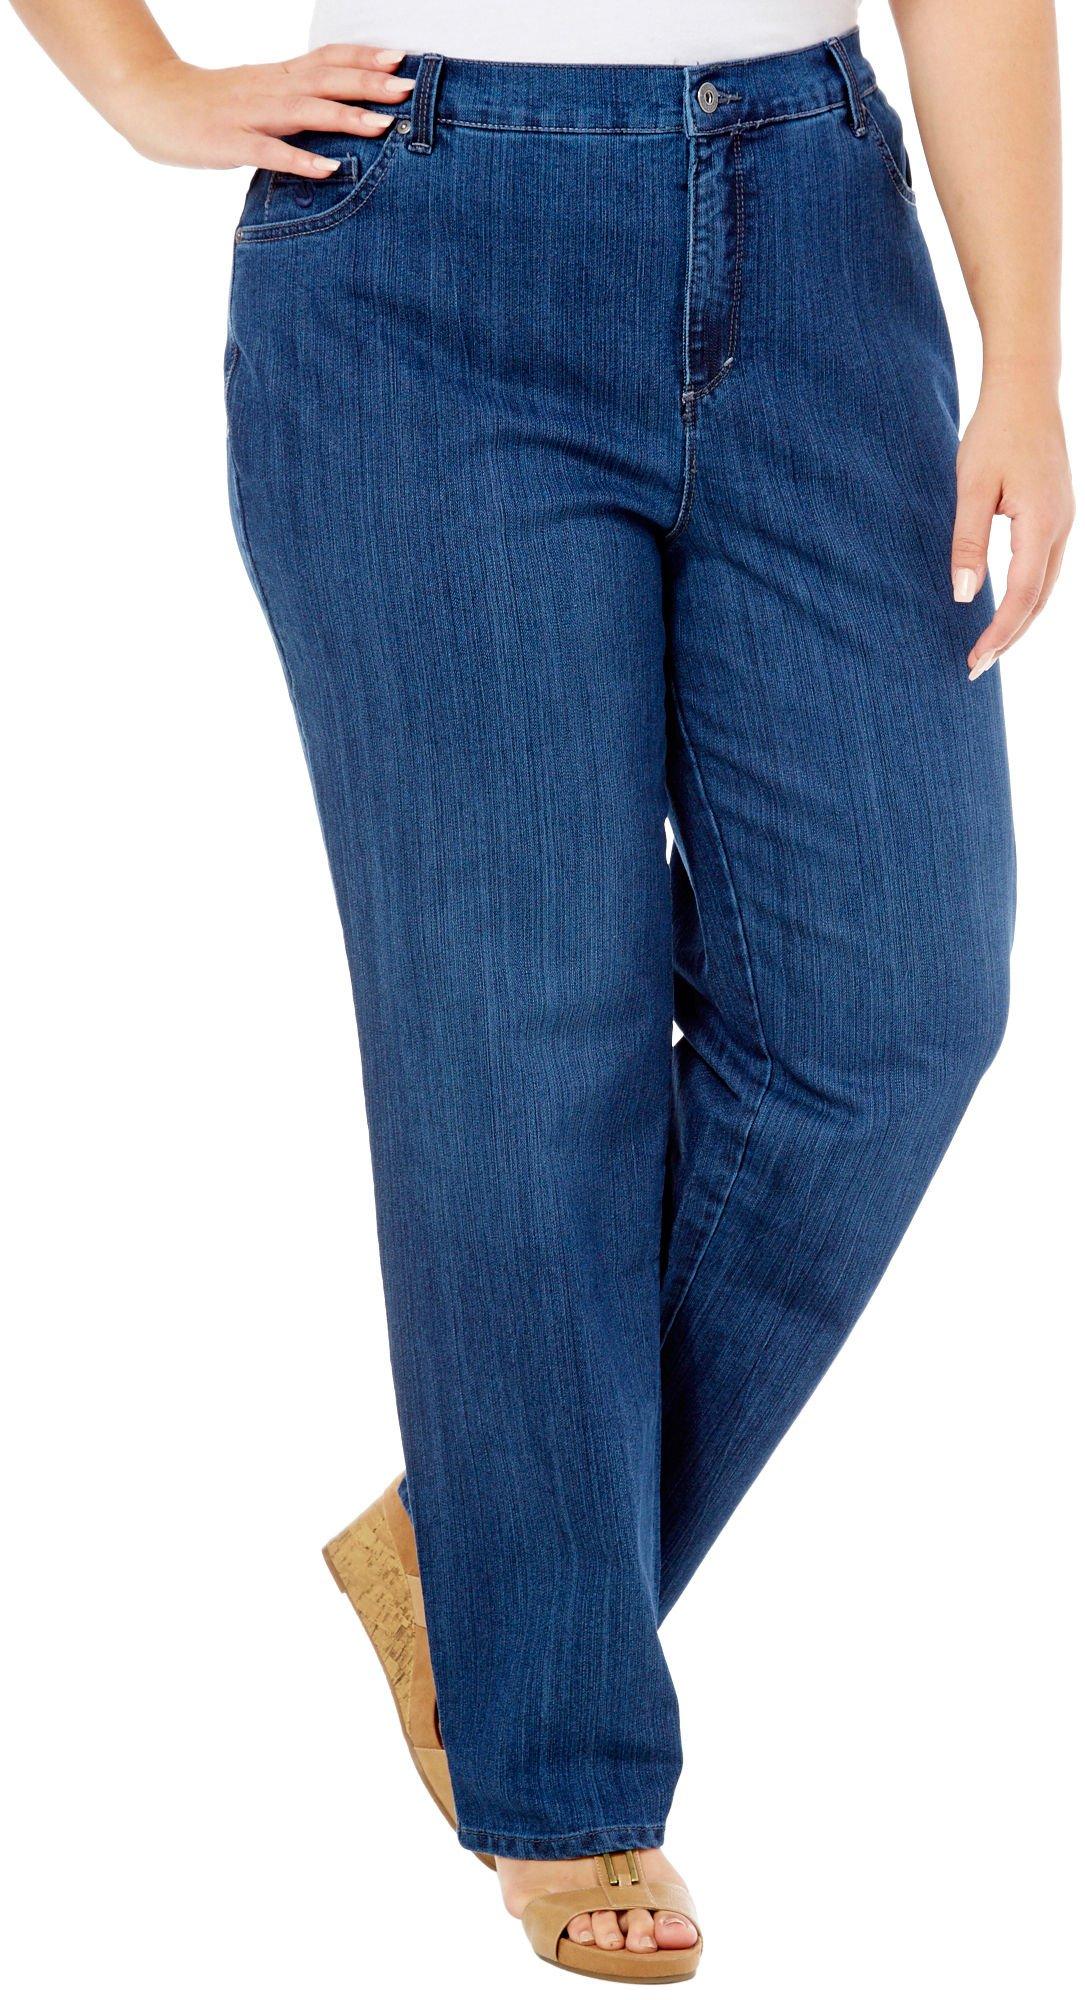 Gloria Vanderbilt Women's Plus-Size Amanda Tapered Leg Jean Average Length 31.5 Inch Inseam (16W, Blue (Scottsdale))